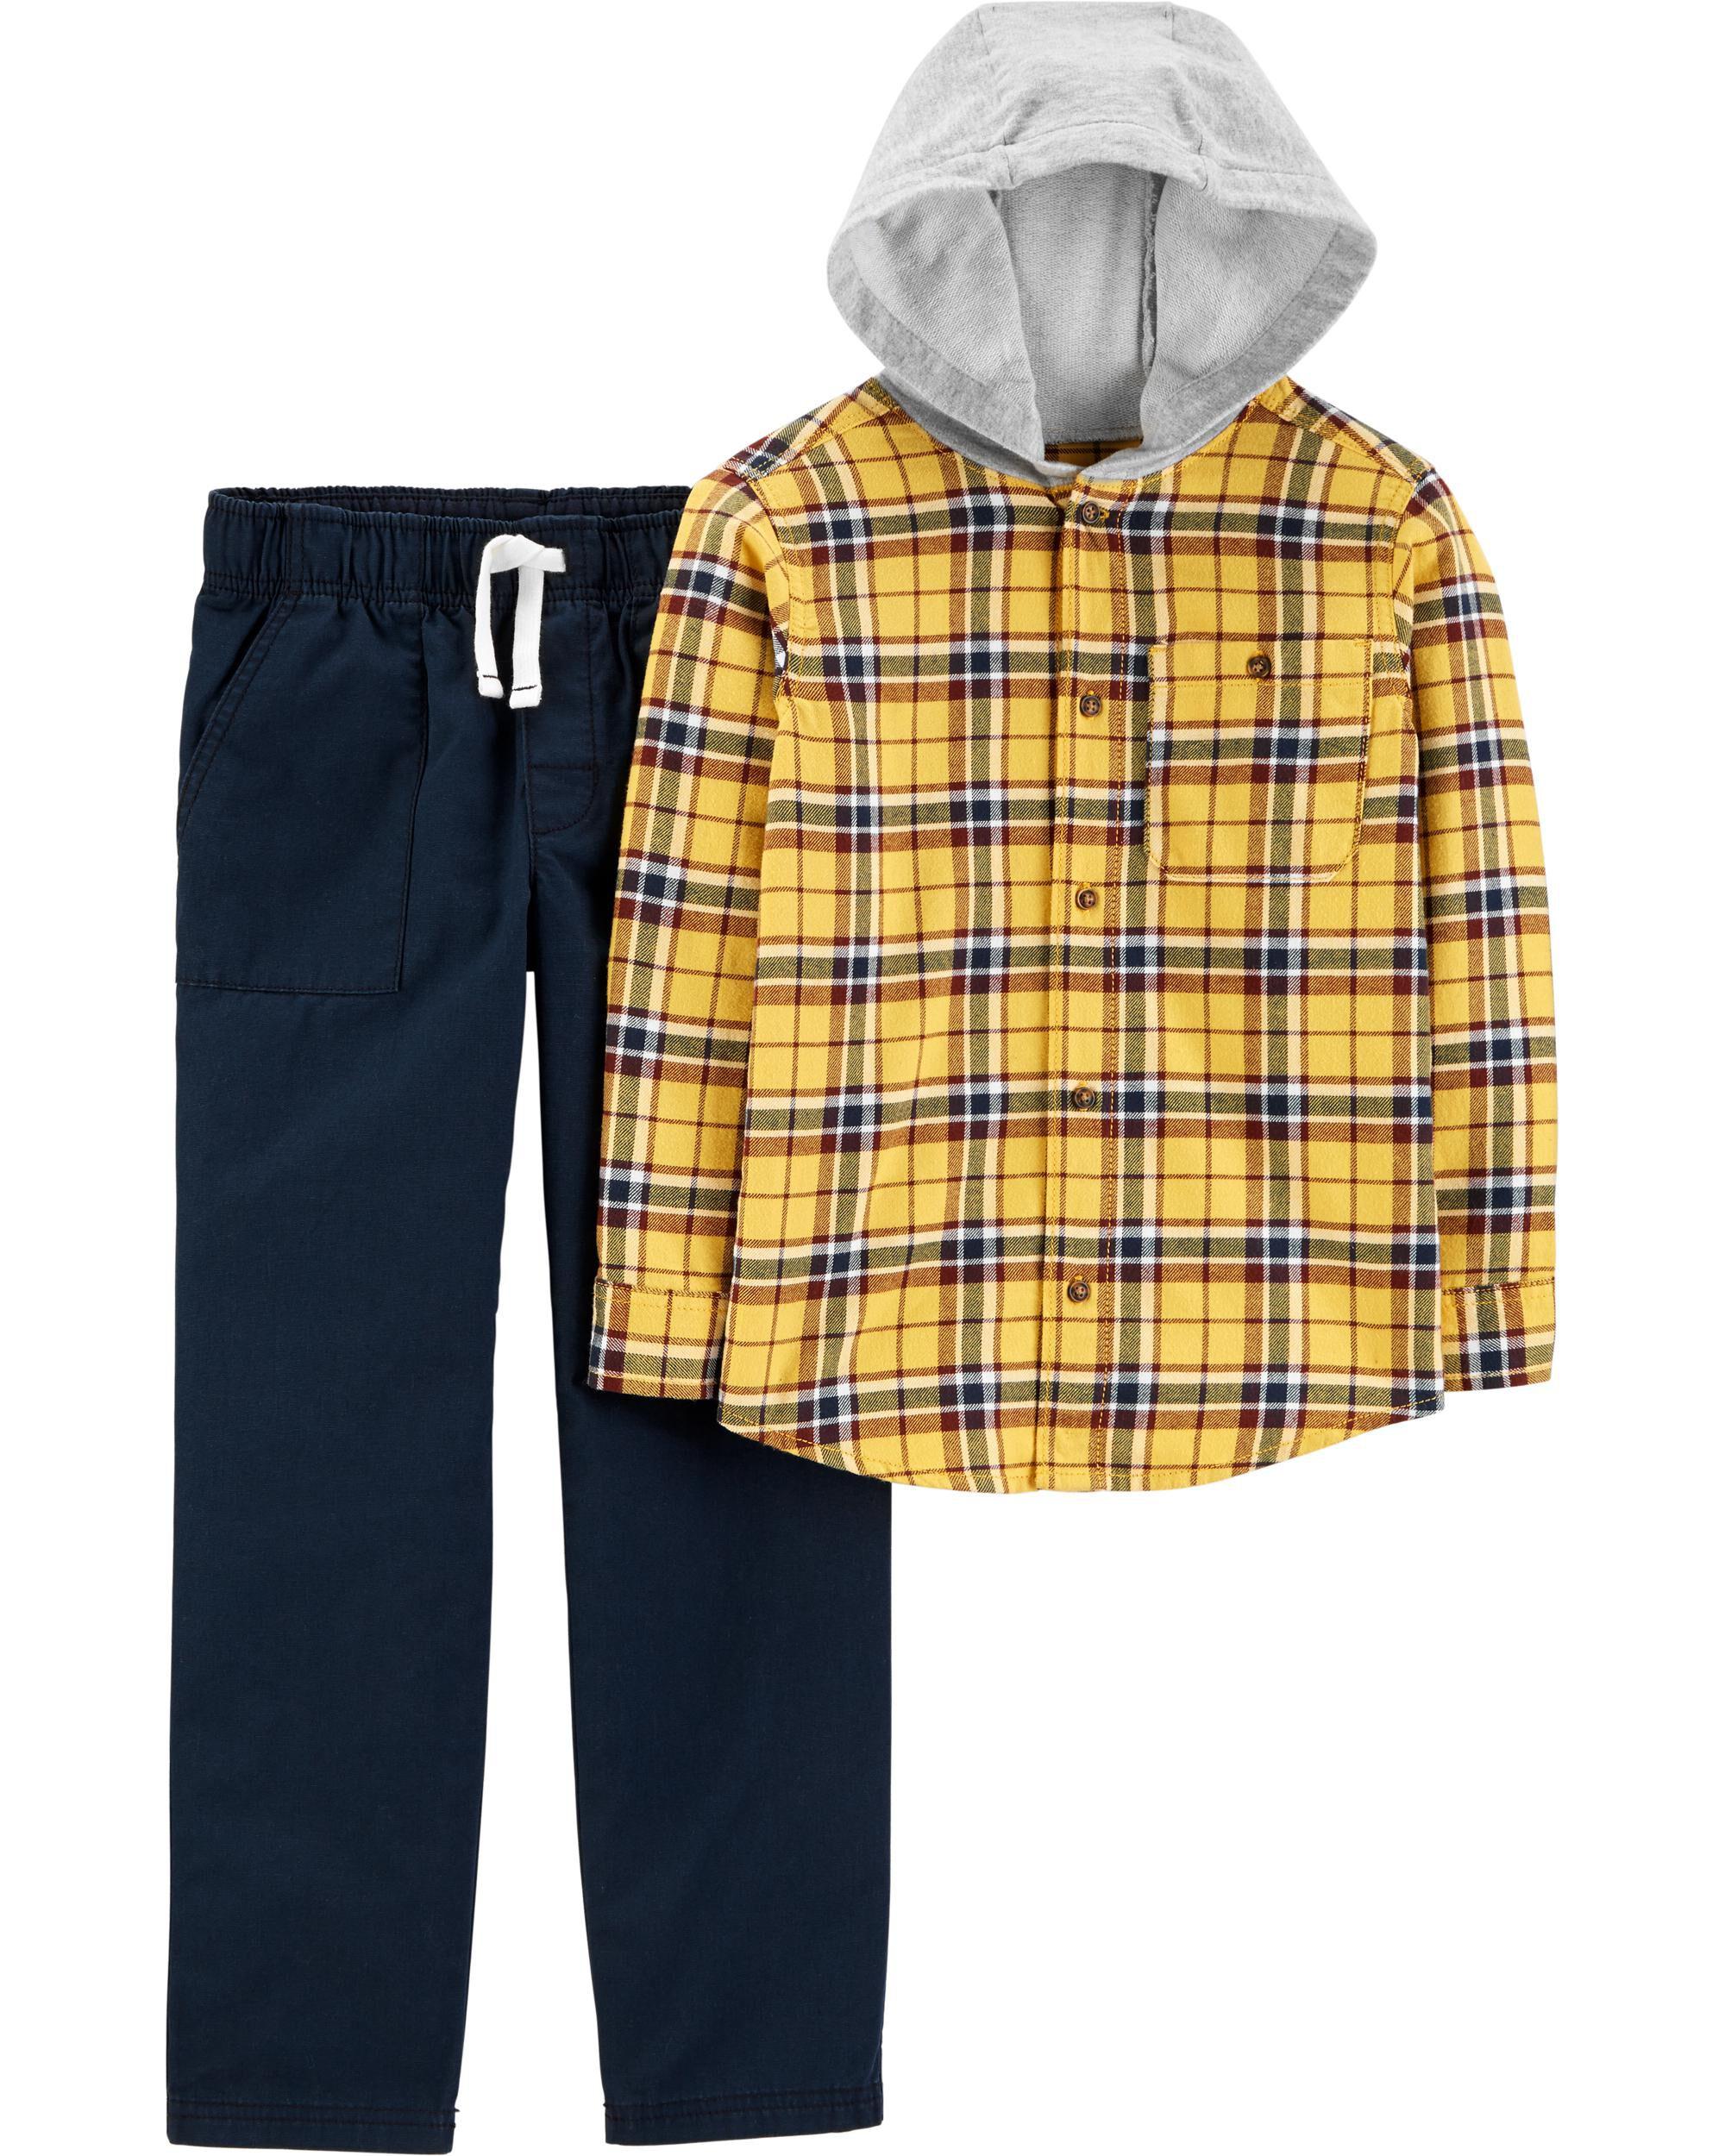 Carter's Boys 2-Piece Hooded Button-Front Shirt /& Jogger Set.size 5T